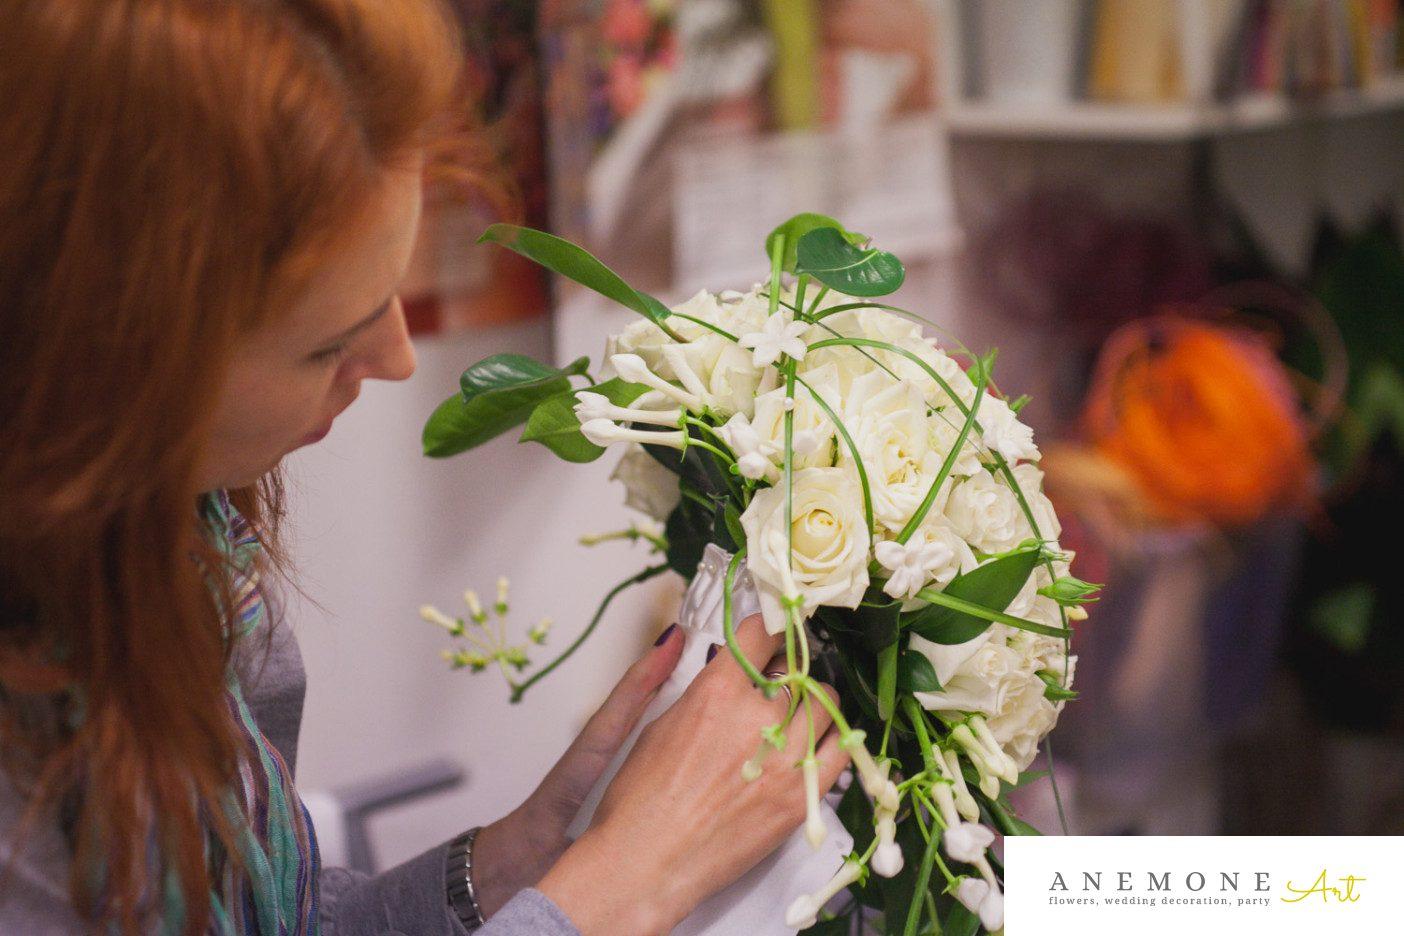 Poza, foto cu Flori de nunta alb, buchet mireasa, stephanotis, trandafiri in Arad, Timisoara, Oradea (wedding flowers, bouquets) nunta Arad, Timisoara, Oradea